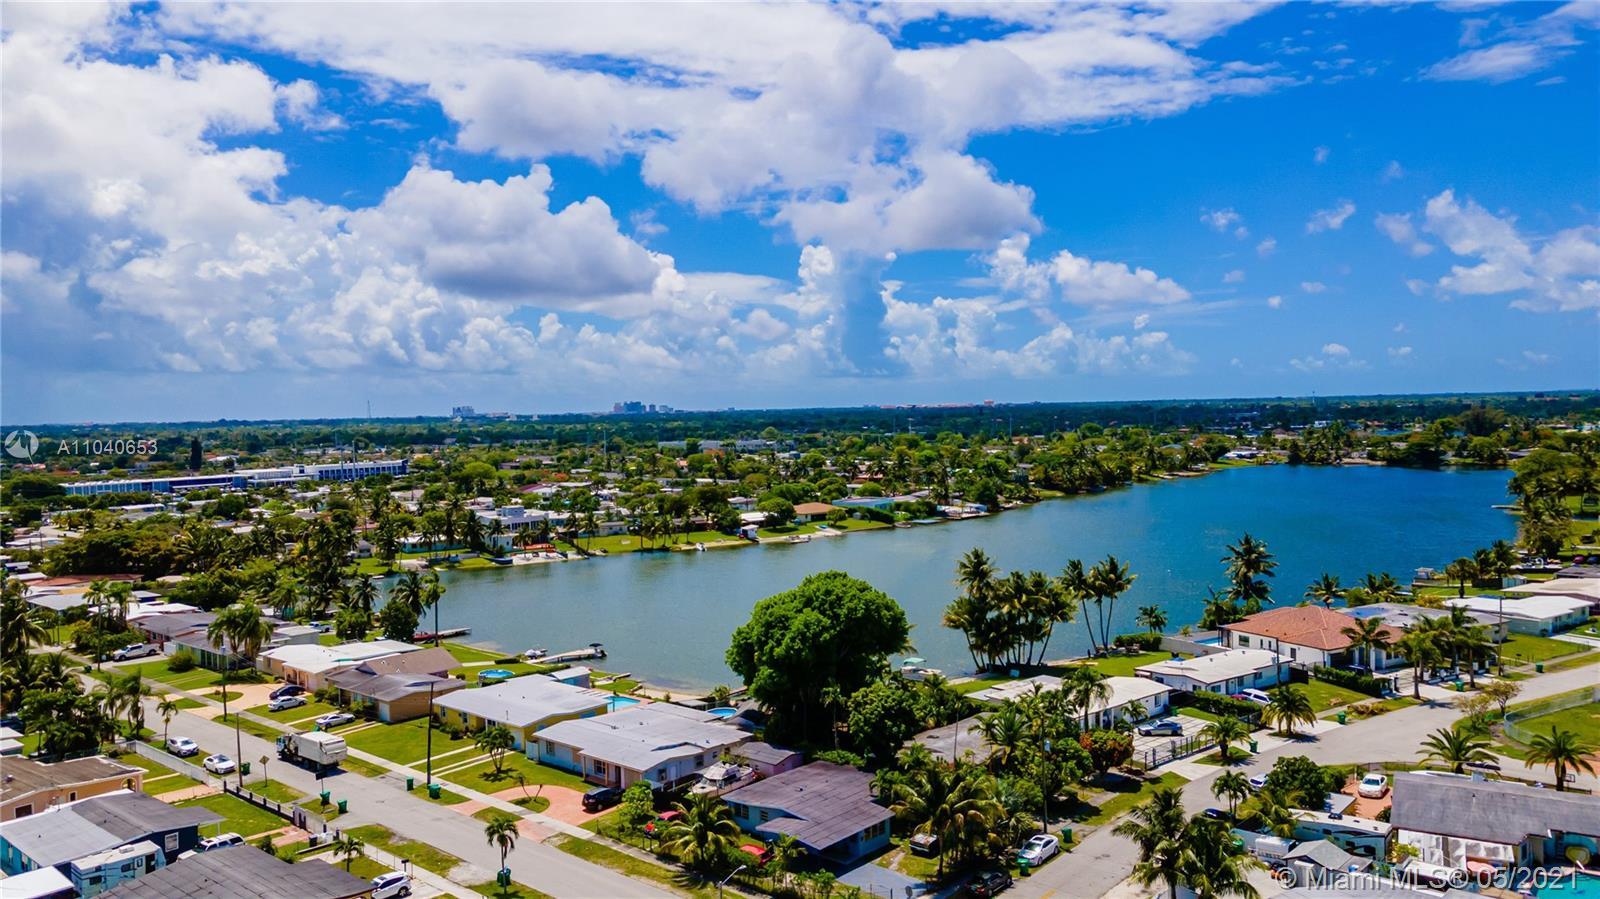 Westwood Lake - 4211 SW 109th Ct, Miami, FL 33165